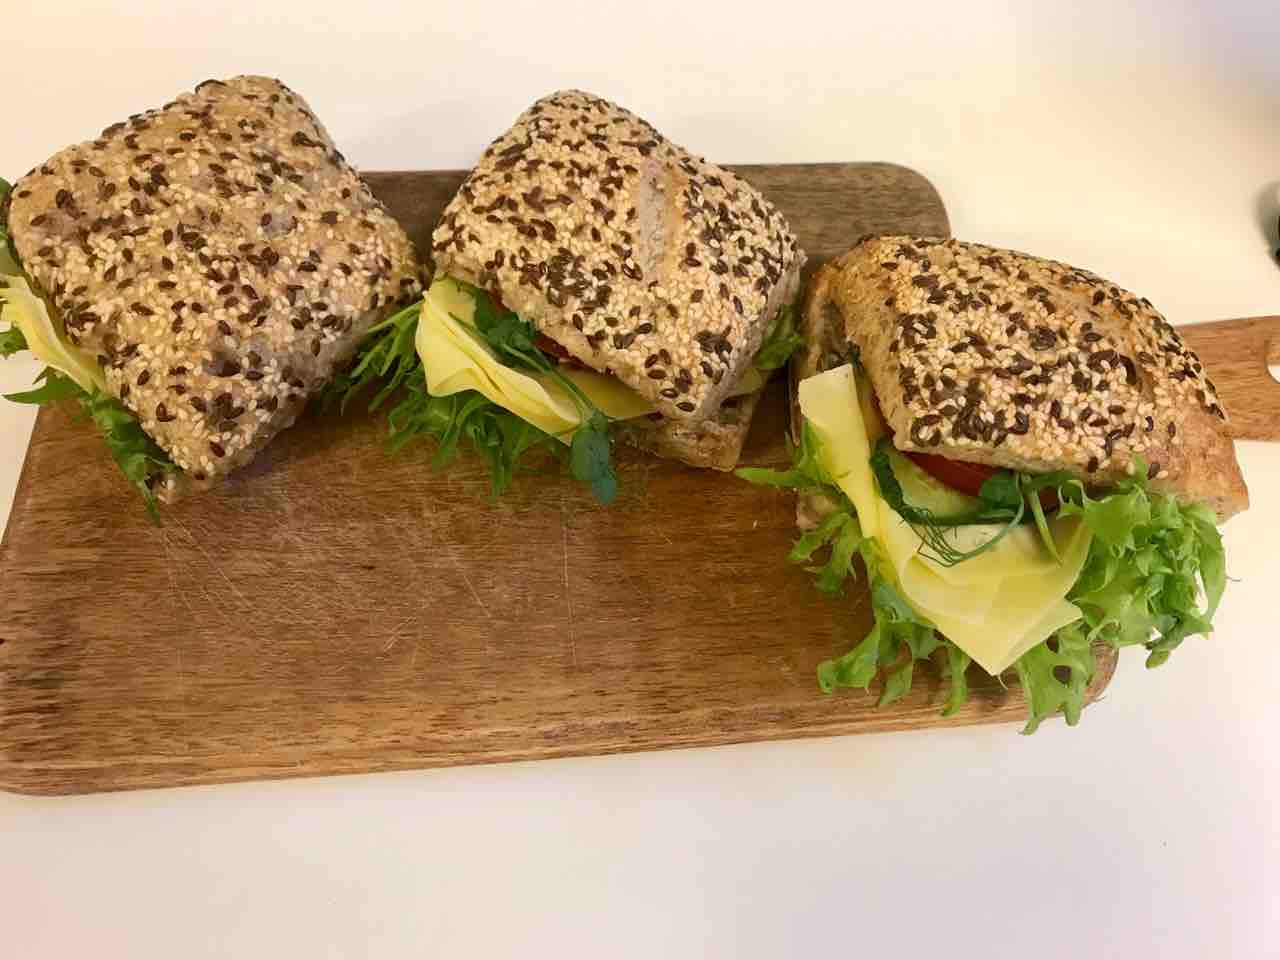 Fresh vegetarian sandwiches (cheese/veggies) from Les Petits Boudins (08/05)